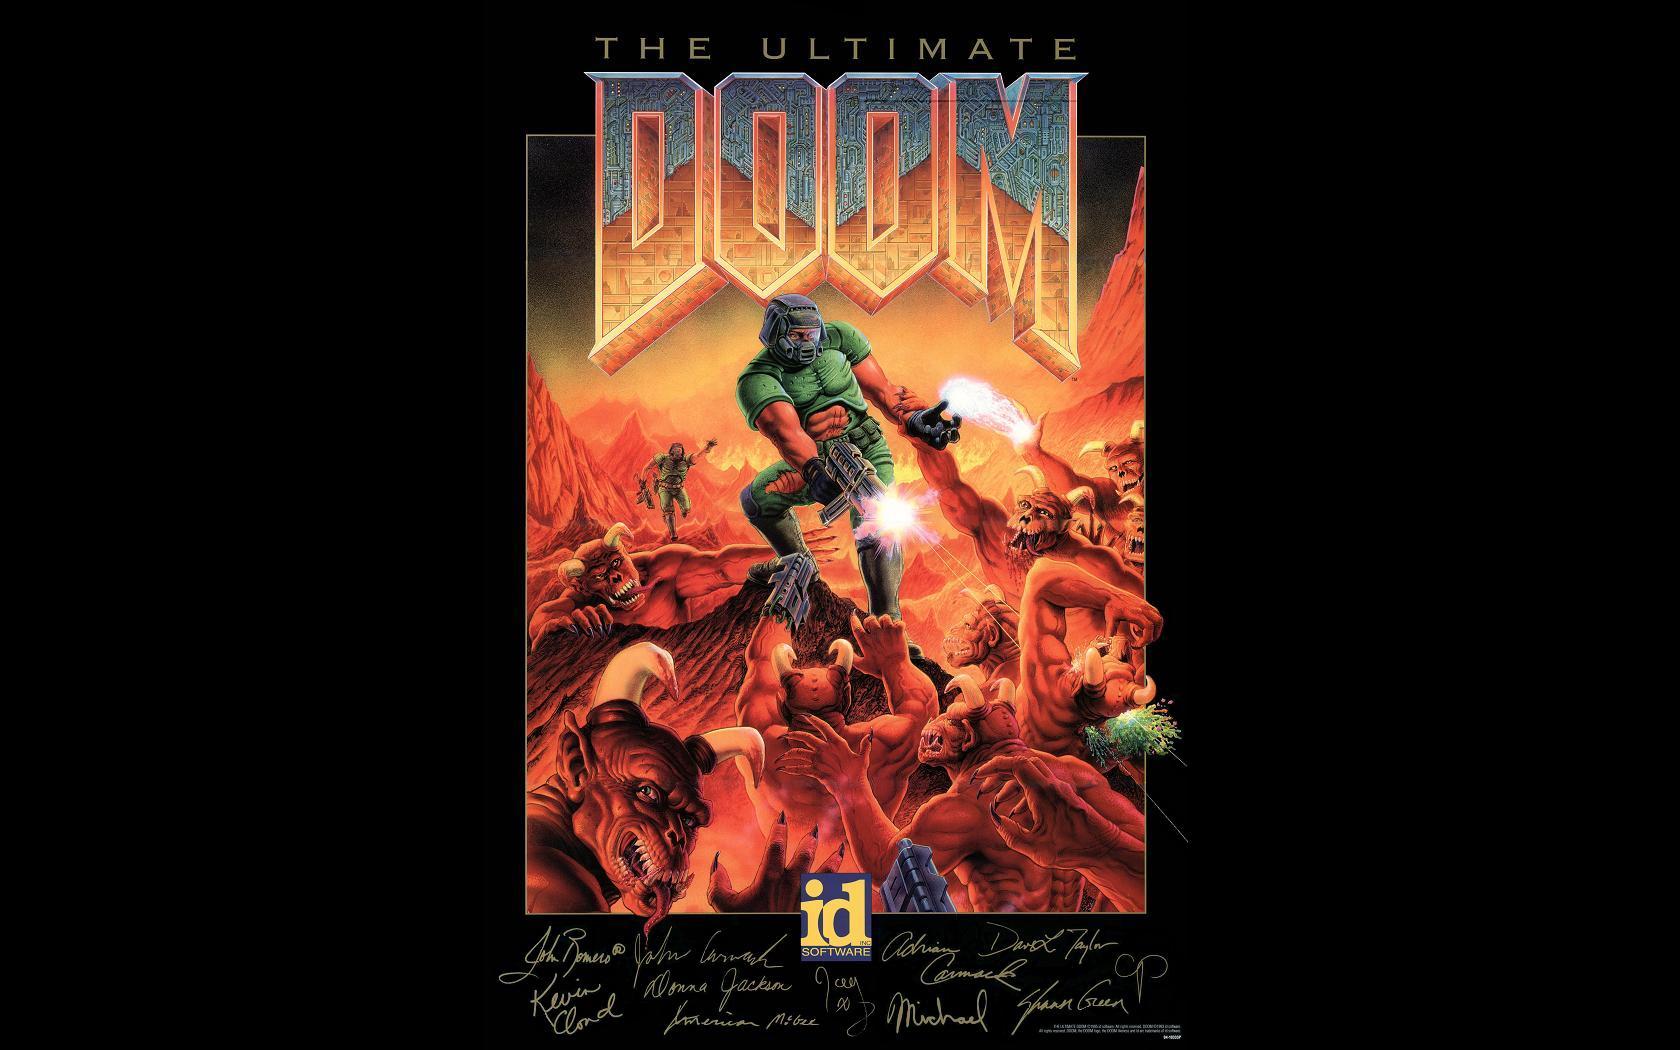 49 Mf Doom Wallpaper On Wallpapersafari